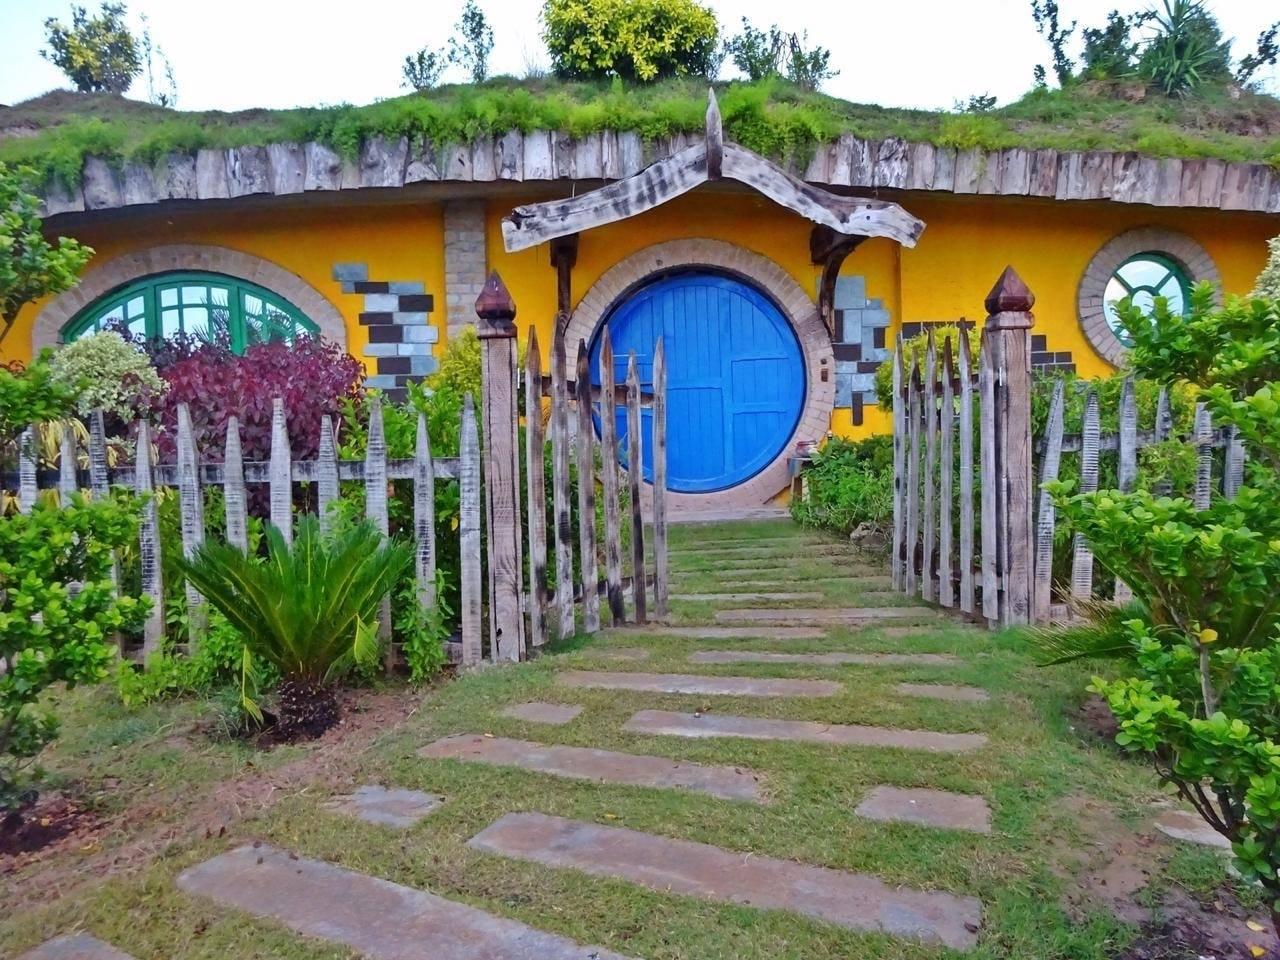 Hobbit home in Islamabad